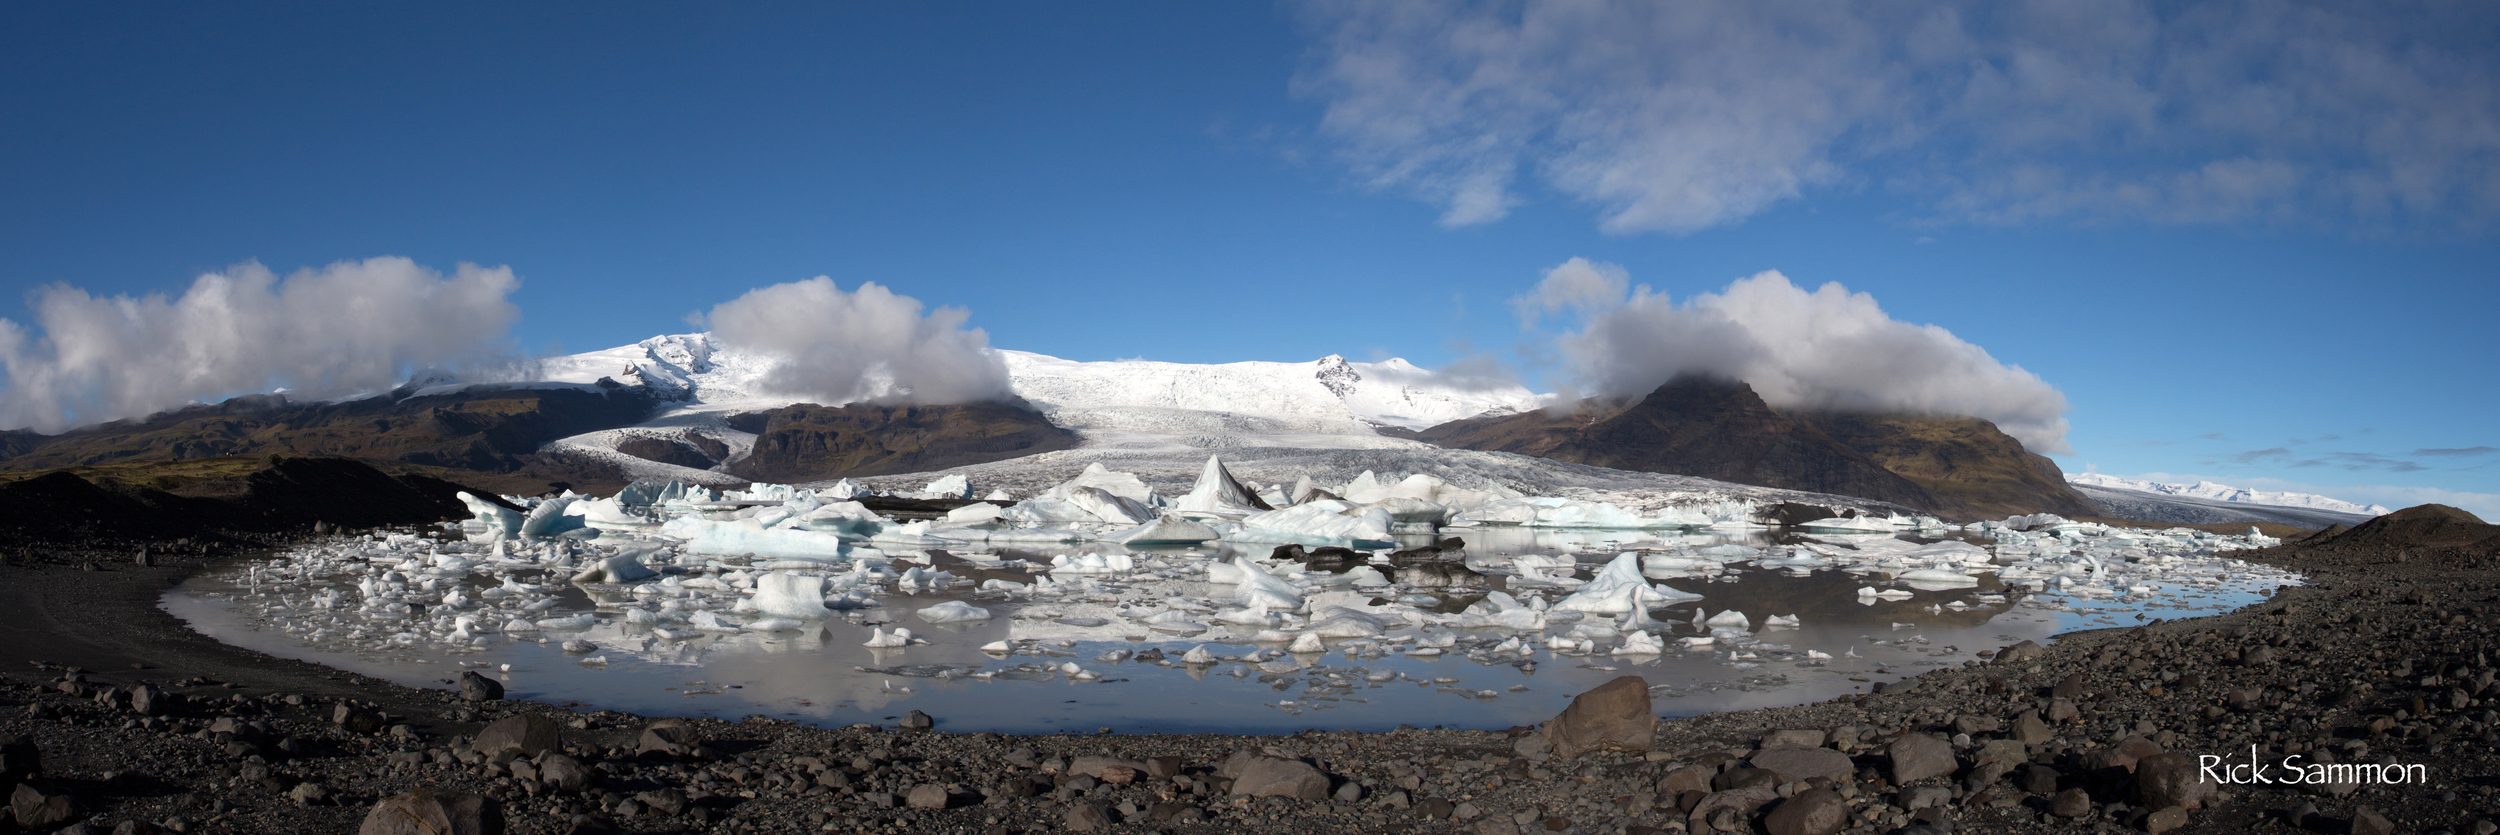 rick sammon iceland 7.jpg